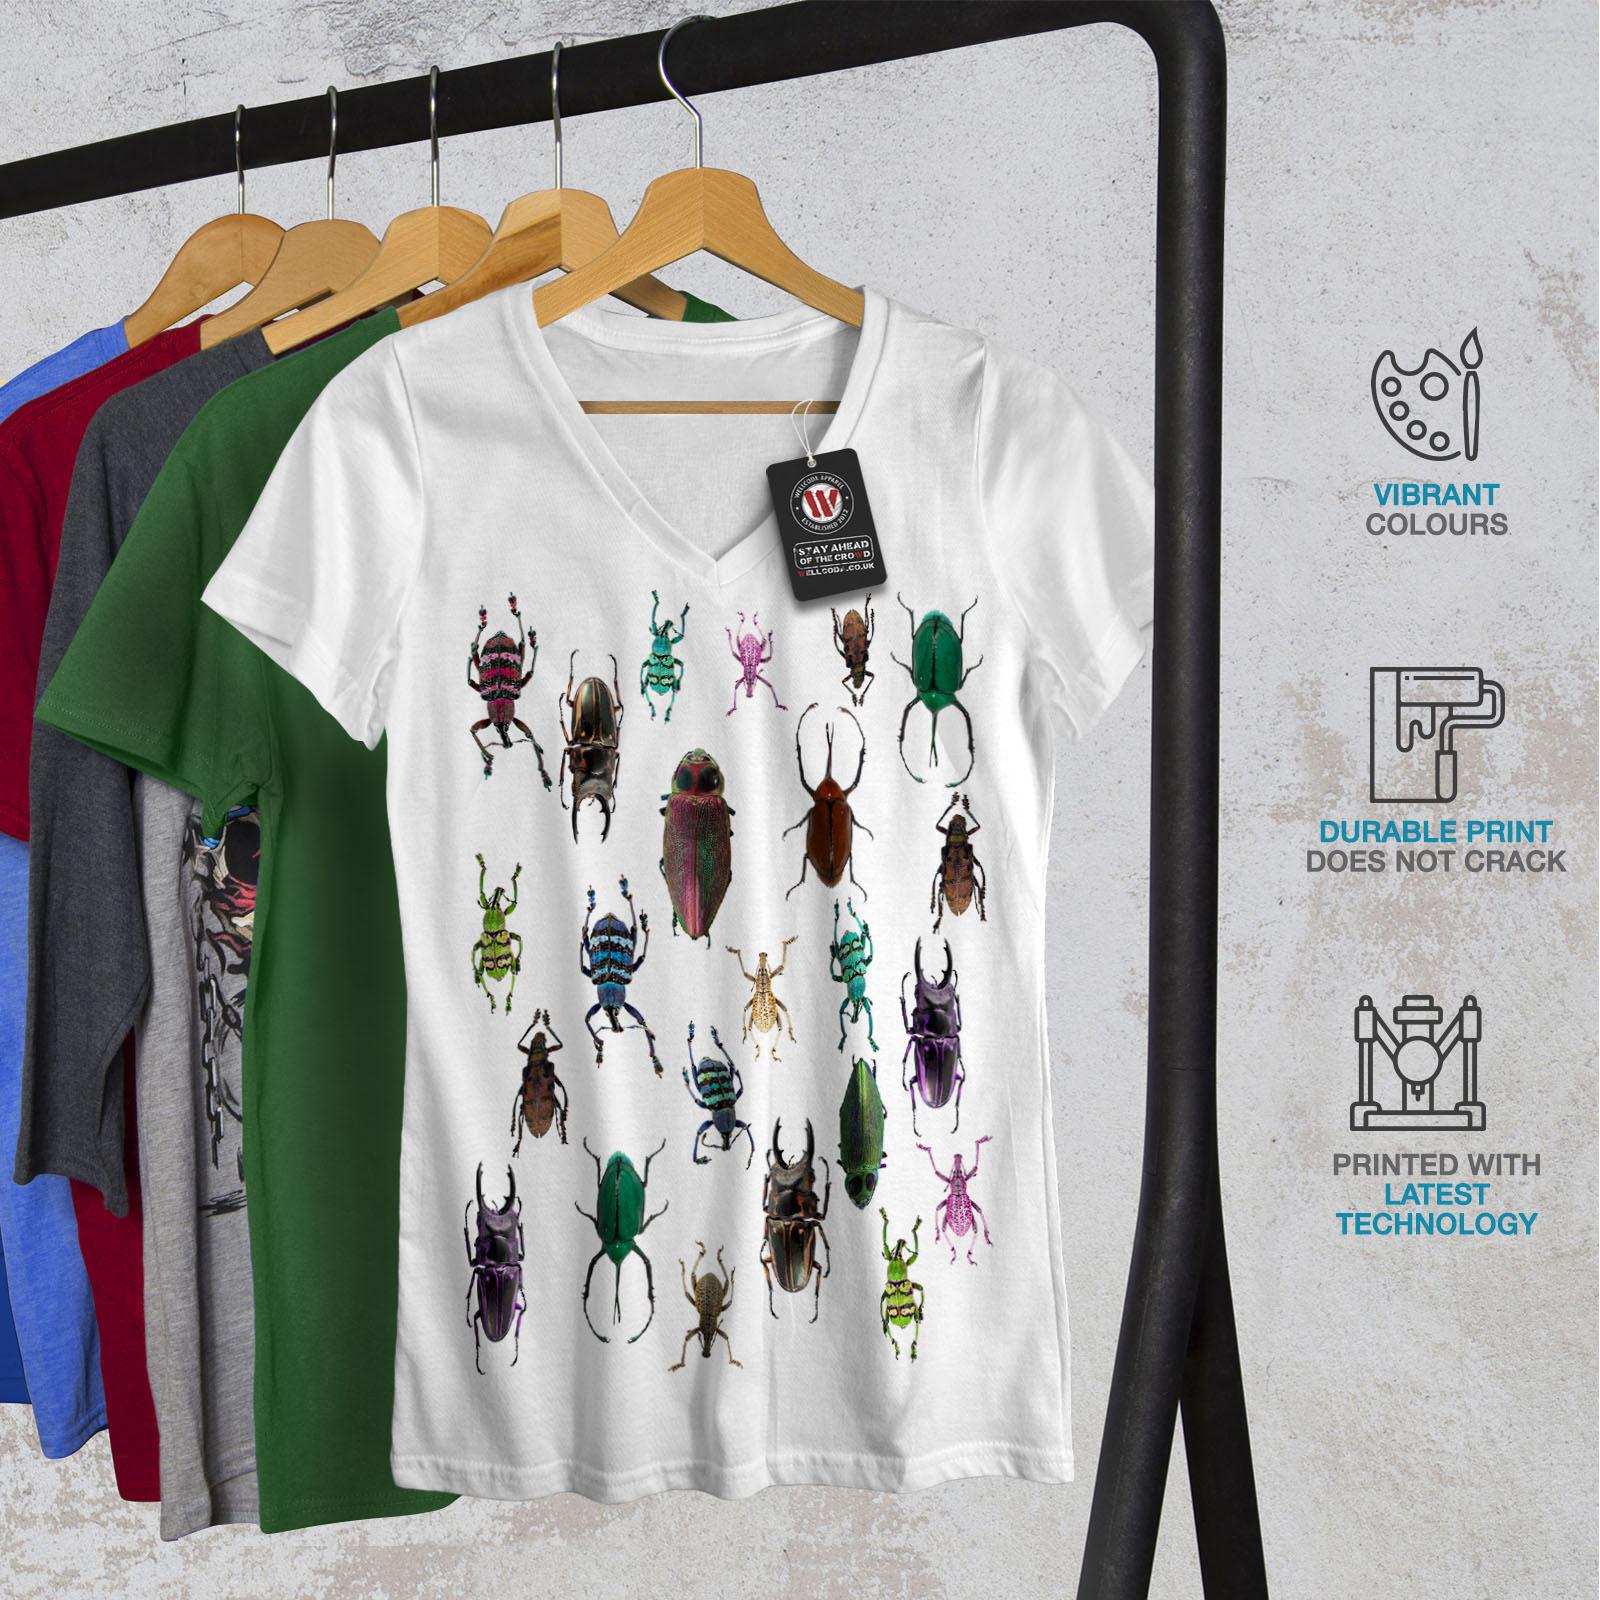 Wellcoda-Colored-Bugs-Womens-V-Neck-T-shirt-Pattern-Graphic-Design-Tee thumbnail 8